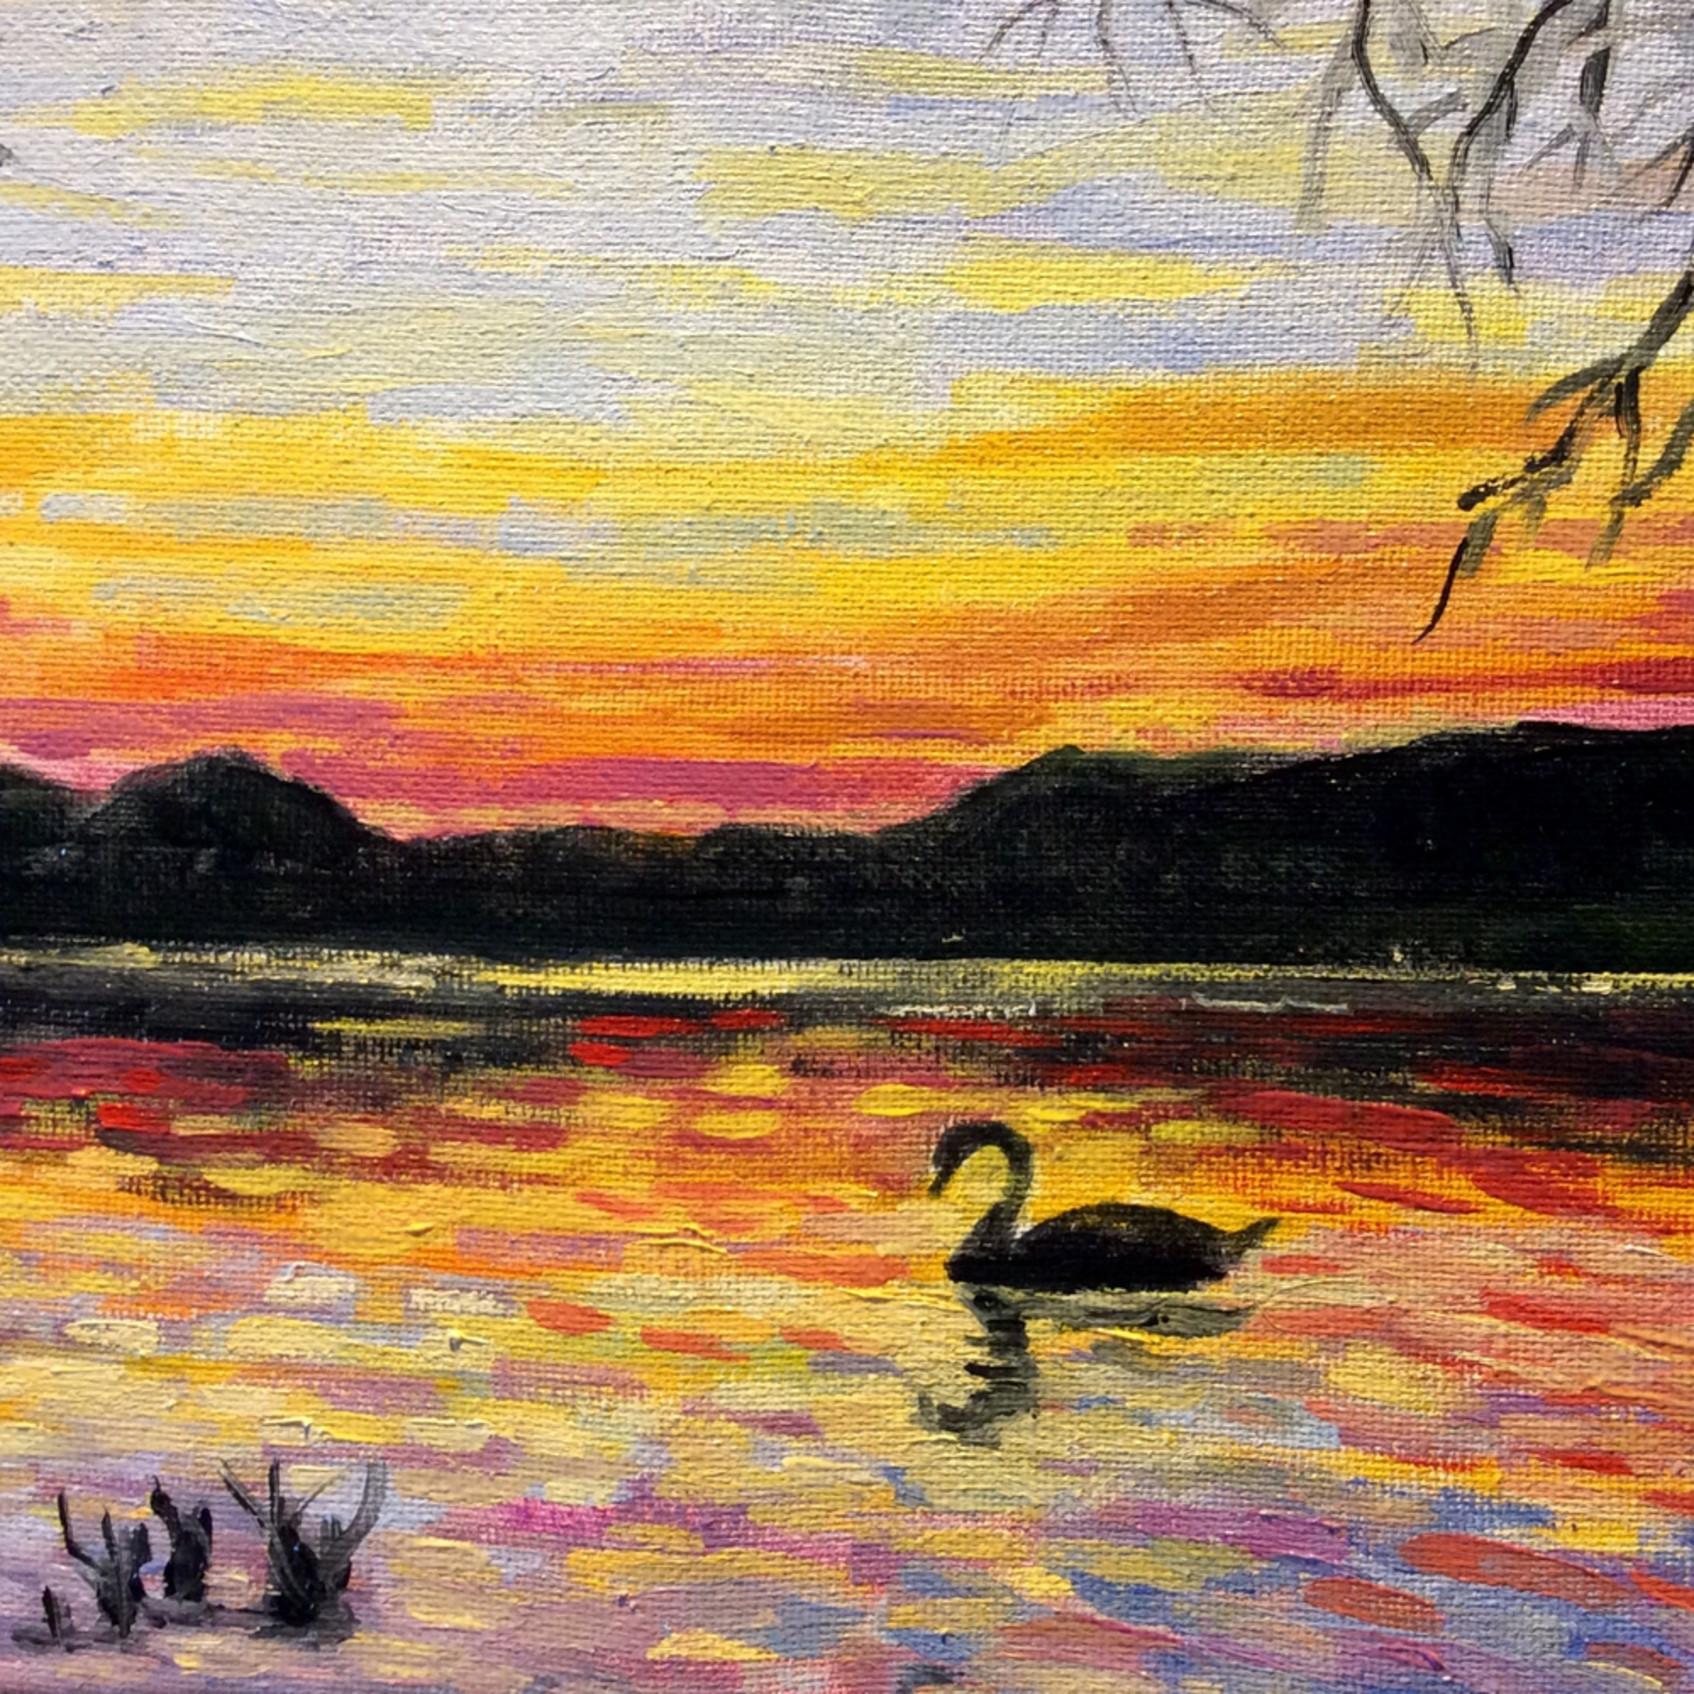 Swan rp2yqr